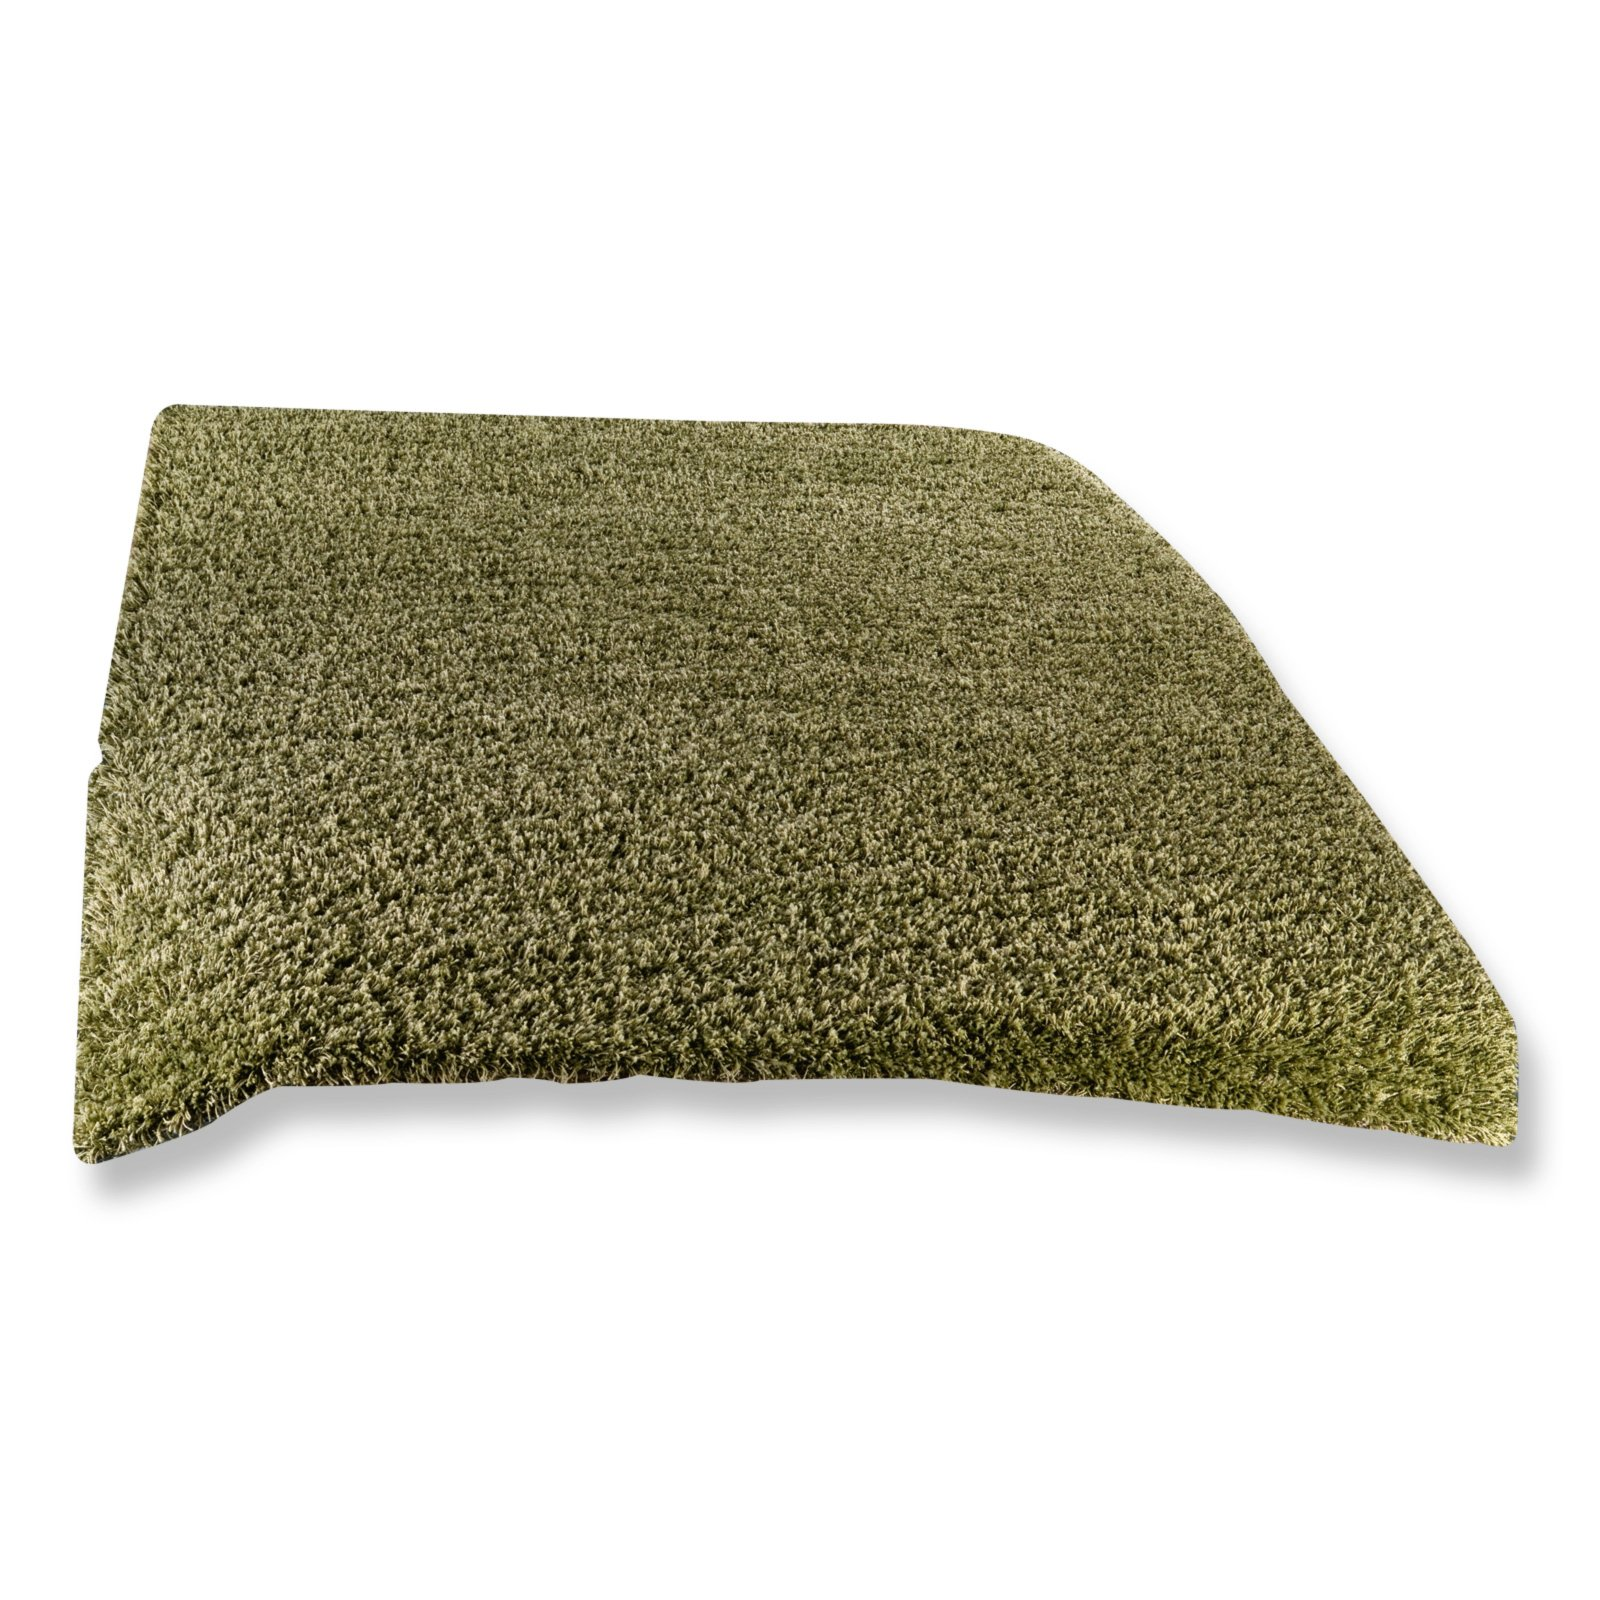 hochflor teppich shaggy plus gr n 65x130 cm hochflor. Black Bedroom Furniture Sets. Home Design Ideas